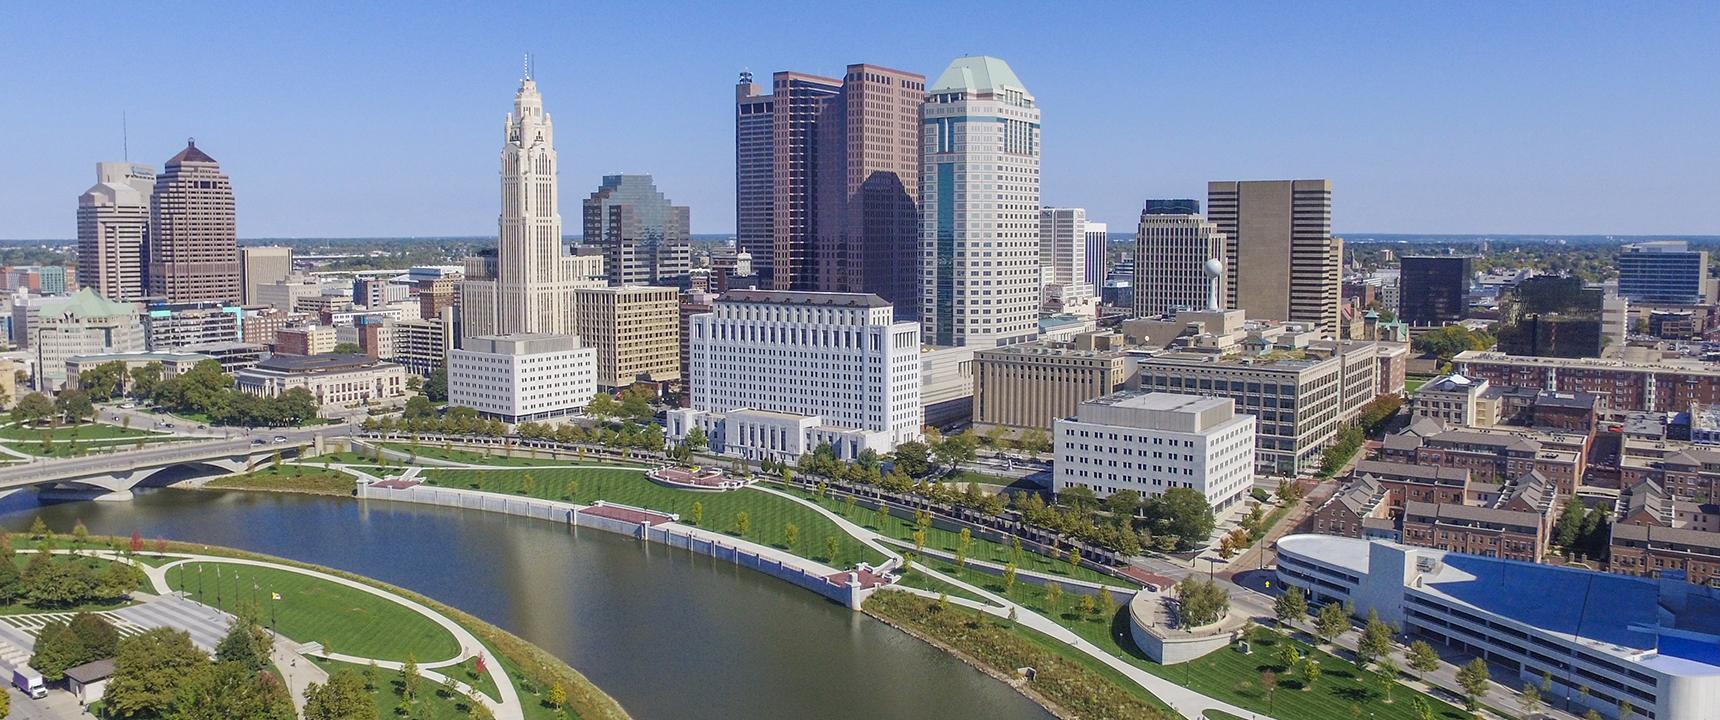 Photo of Columbus, Ohio where the Ohio Business Center is located.